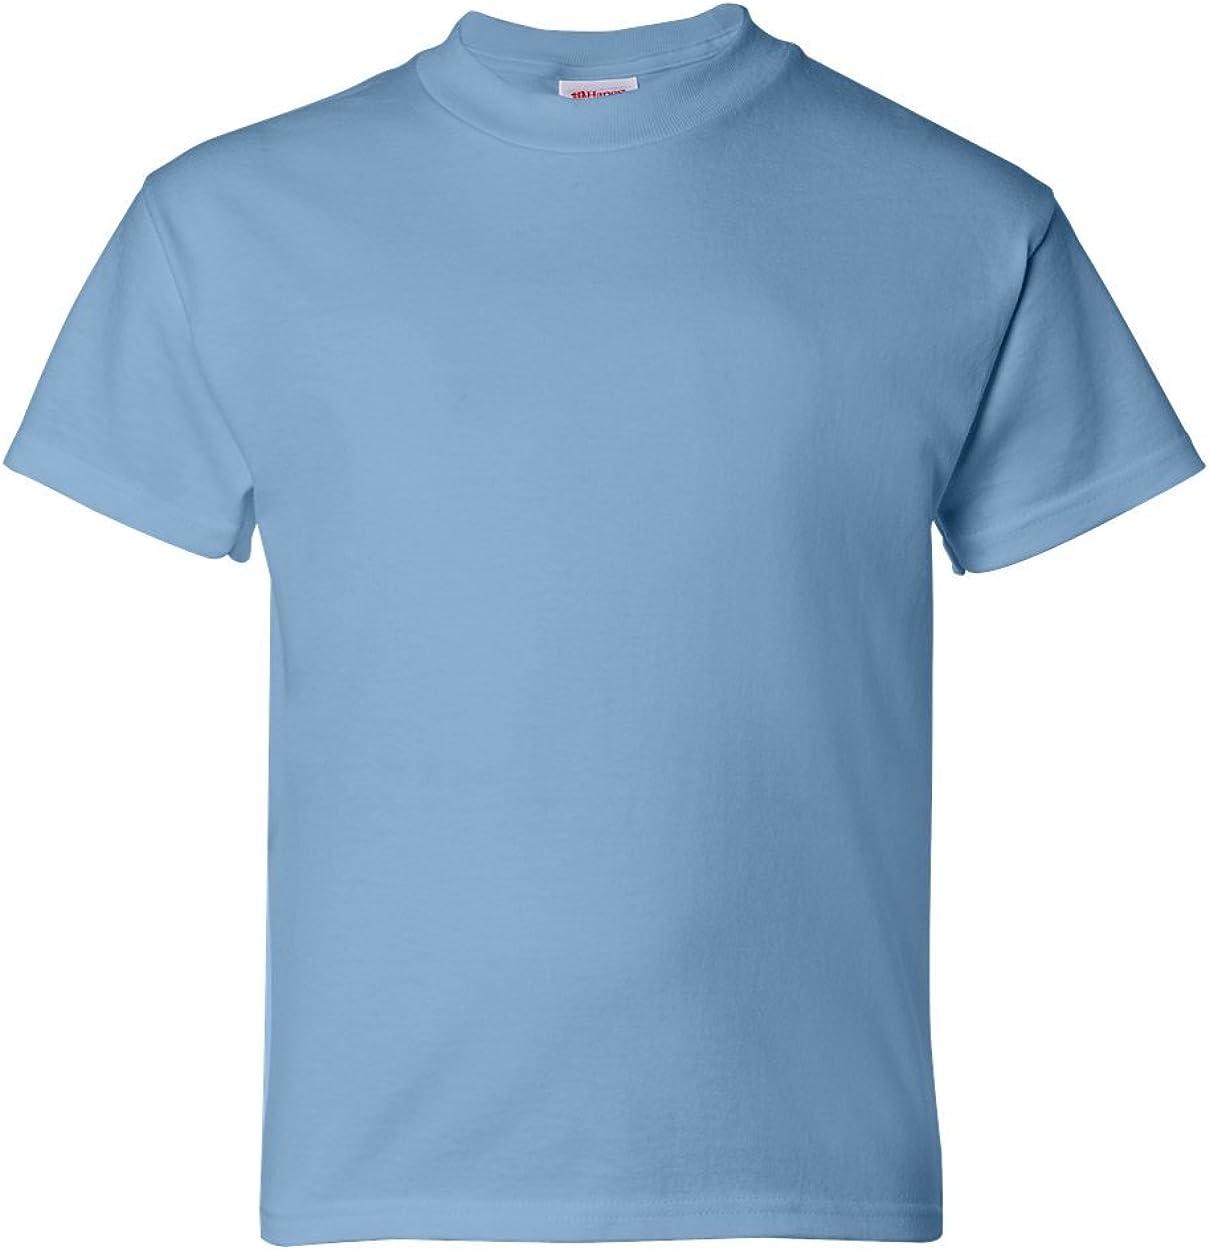 Hanes Youth 5.2 Oz. ComfortSoft Cotton T-Shirt, Small, Light Blue